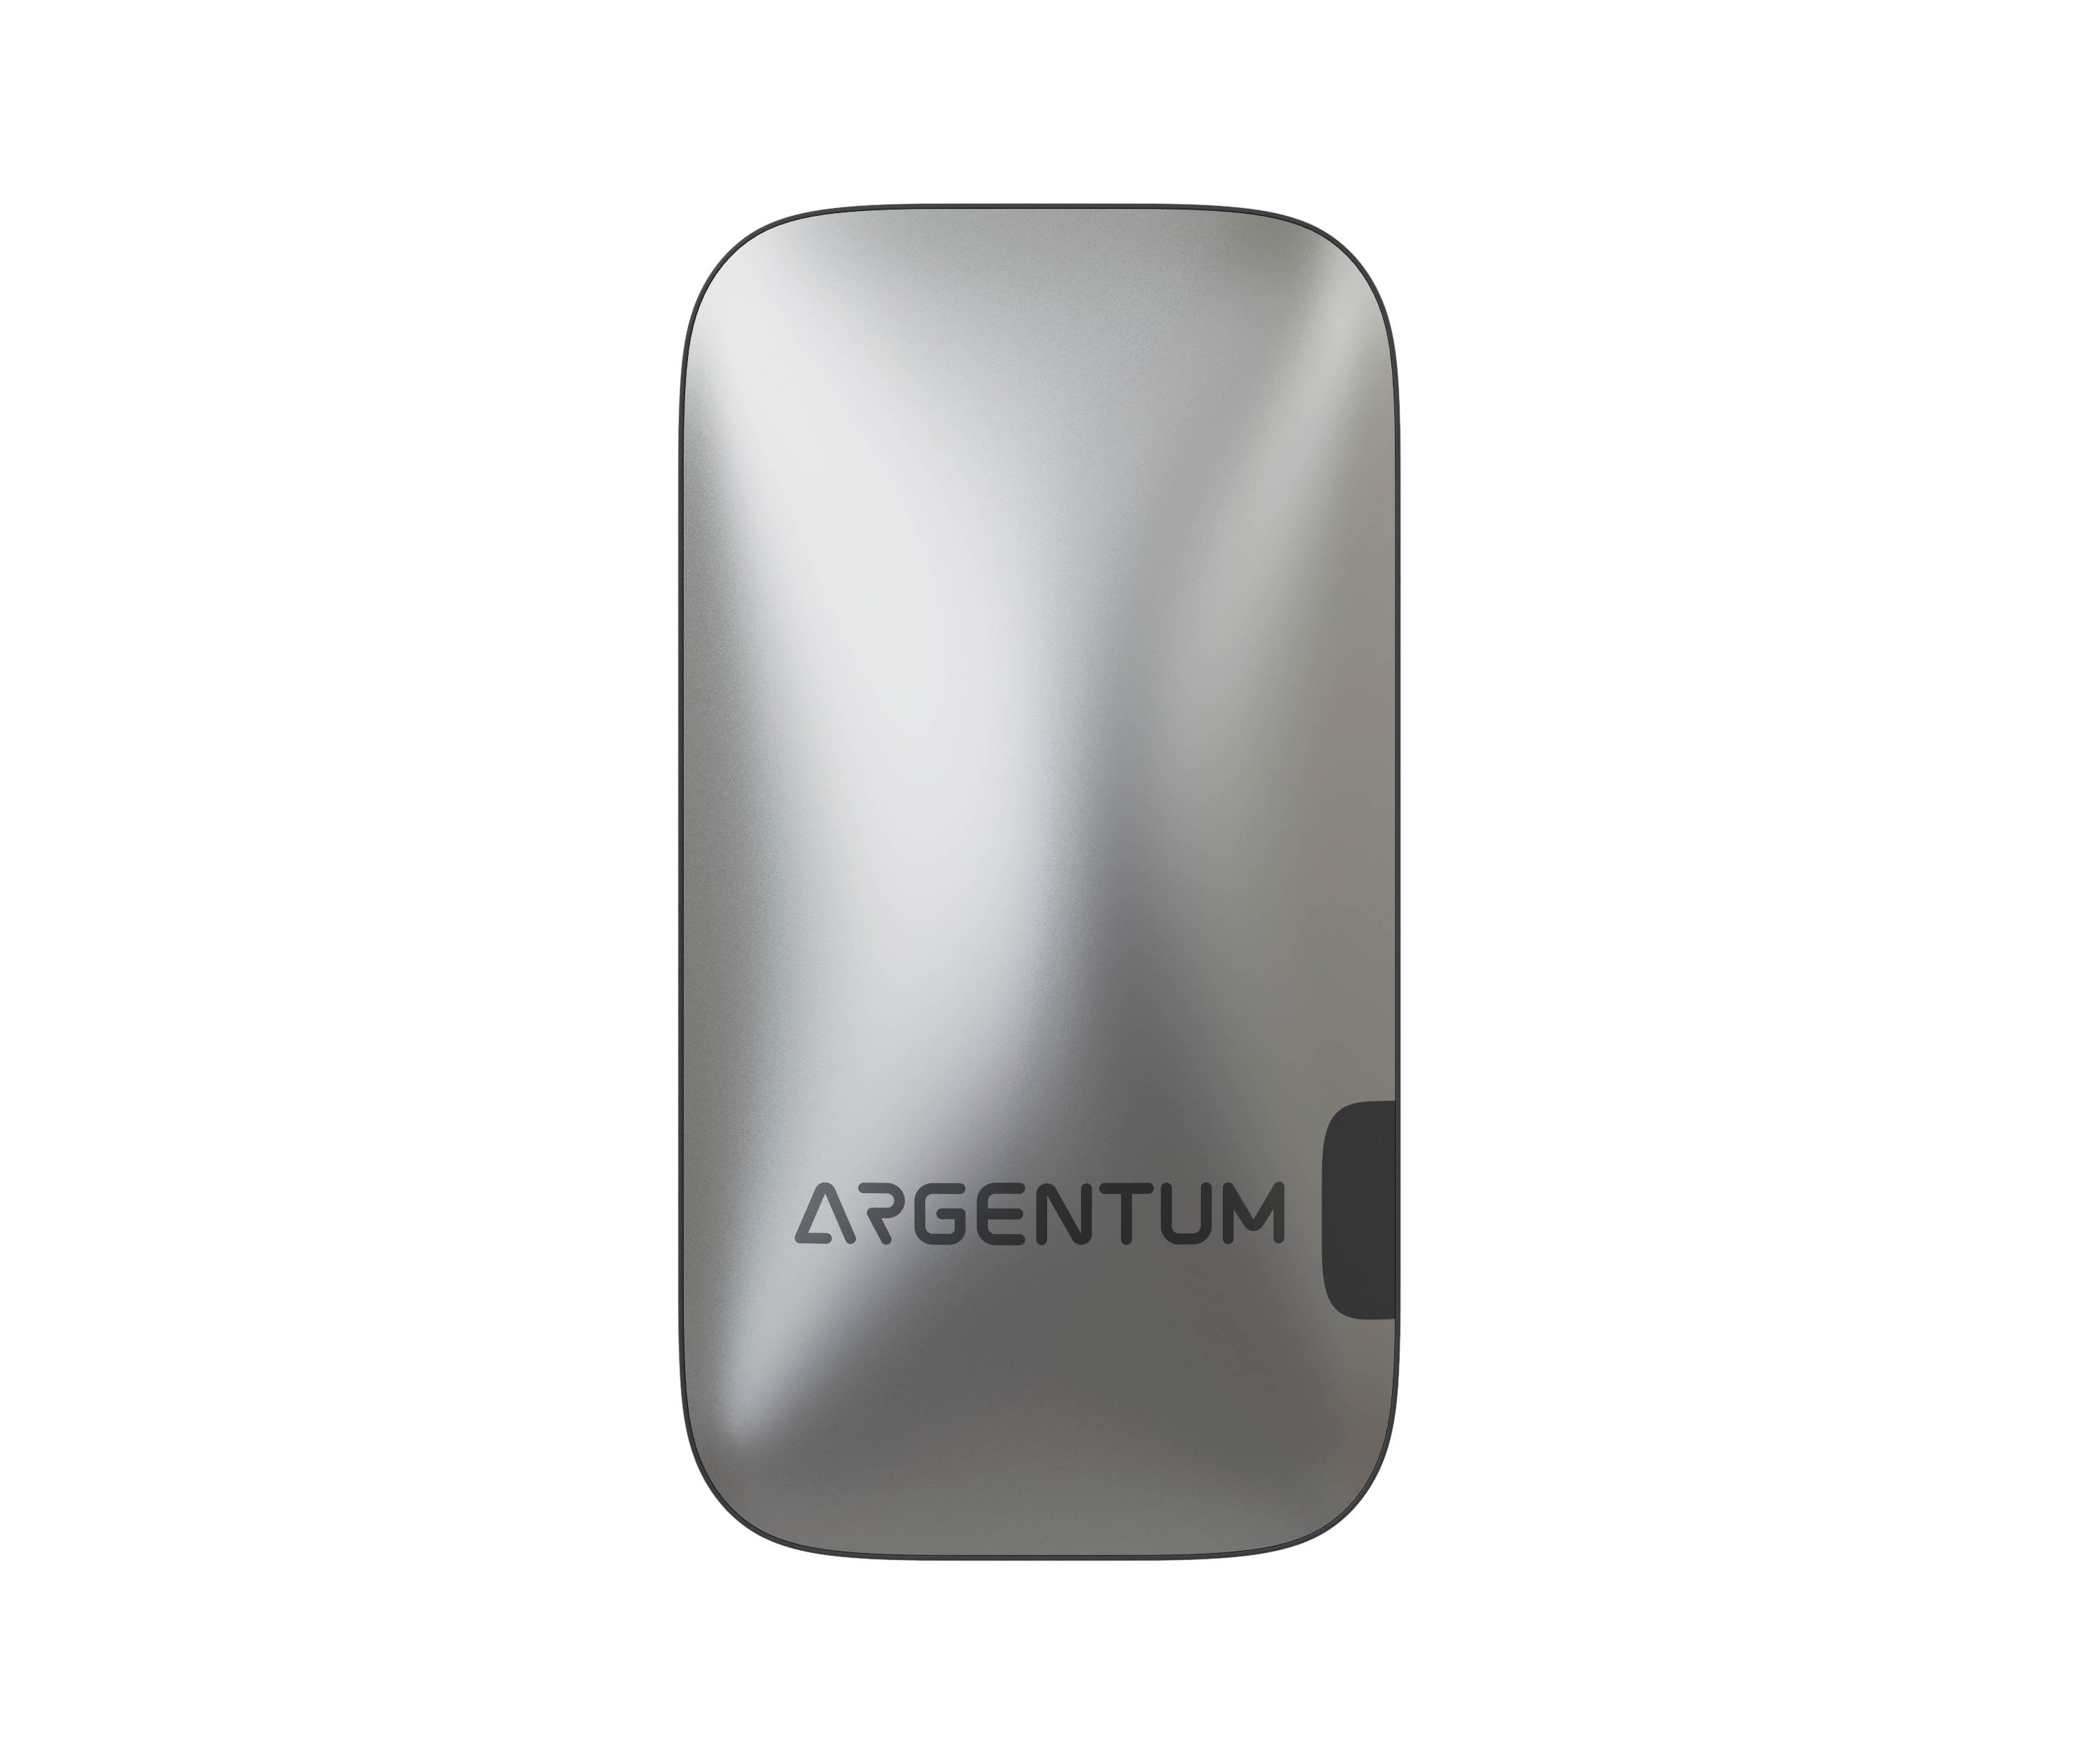 the argentum spacrpanel product